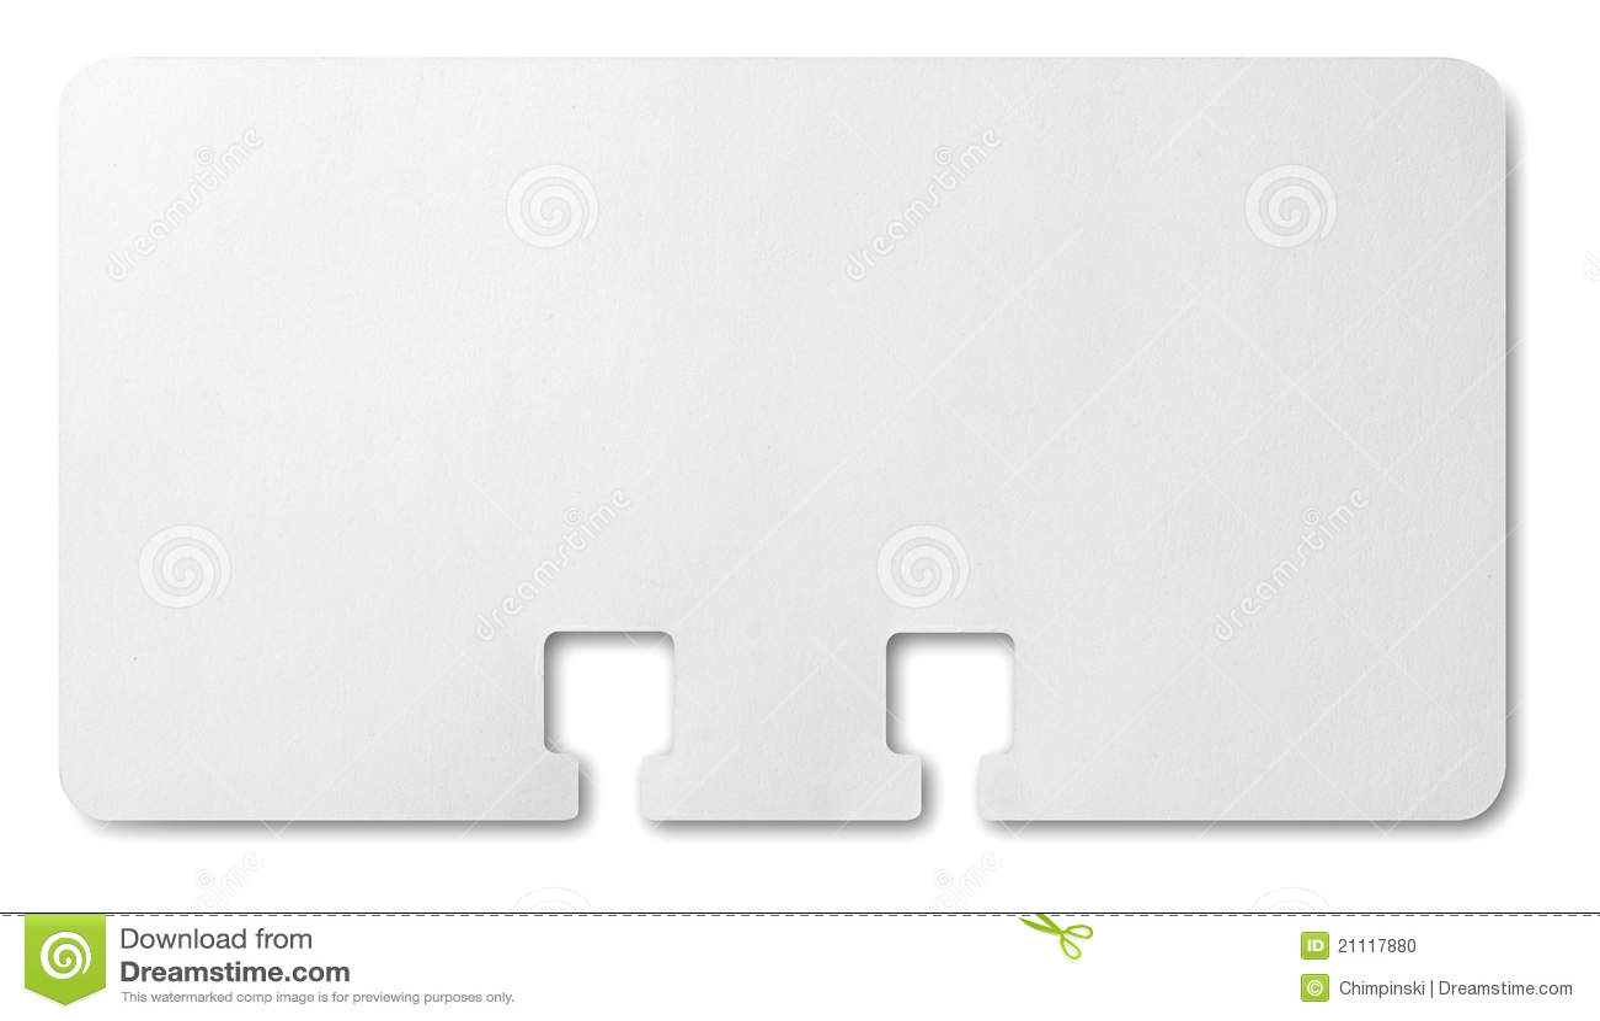 rolodex card stock photo image 21117880. Black Bedroom Furniture Sets. Home Design Ideas